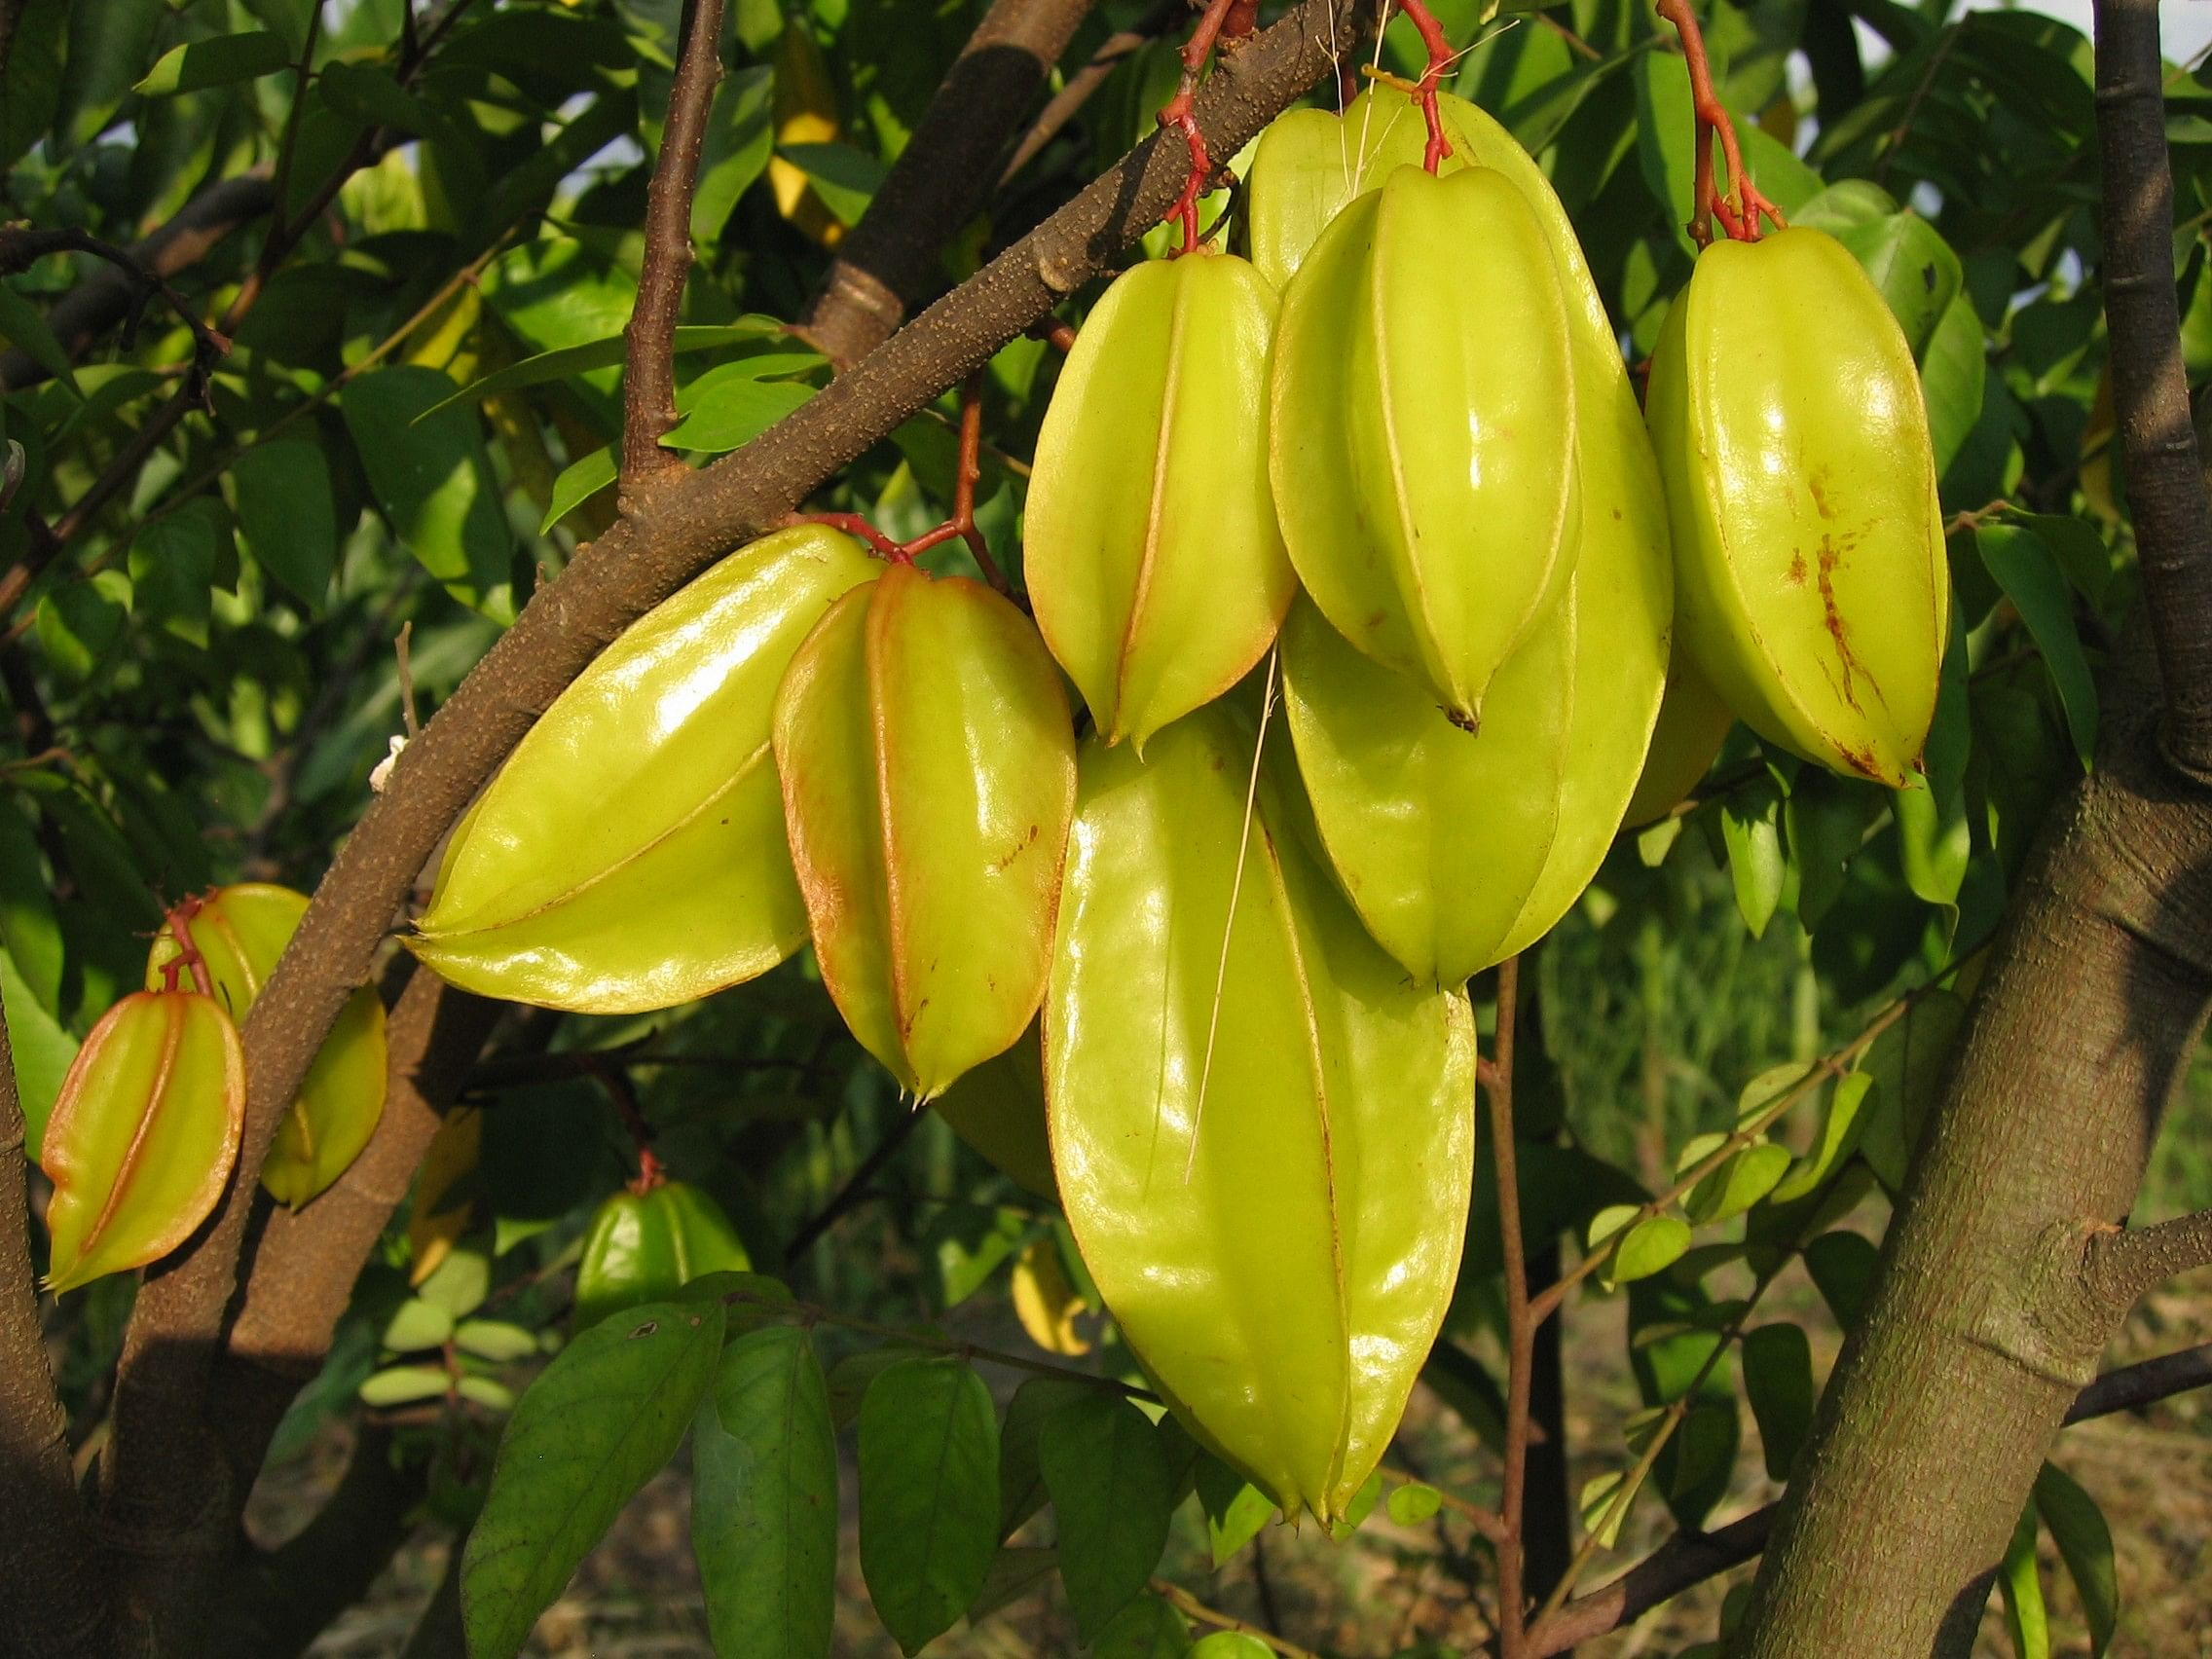 averrhoa_carambola_ripe_fruits_at_ciat_1